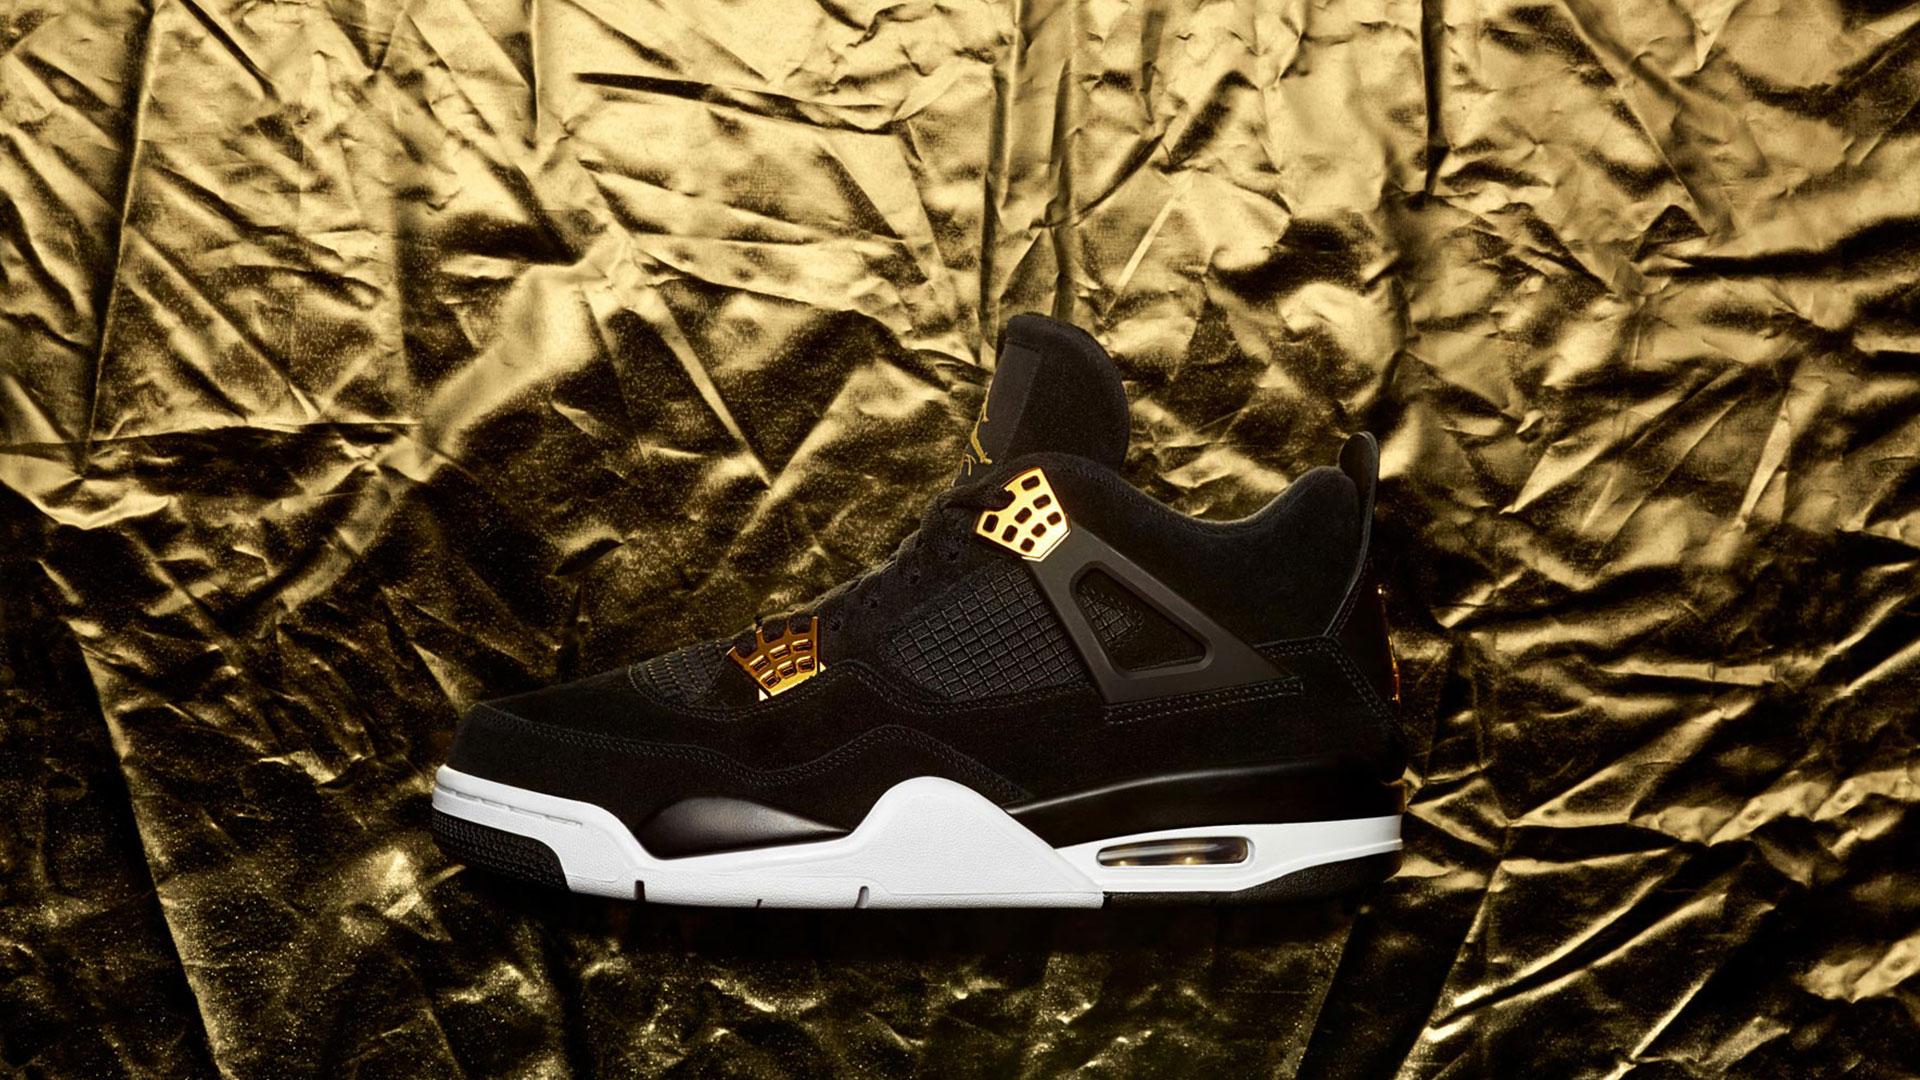 f952d8492dcb Launch of Nike Air Jordan 4 Retro  Royalty  - Mens Fashion Blog